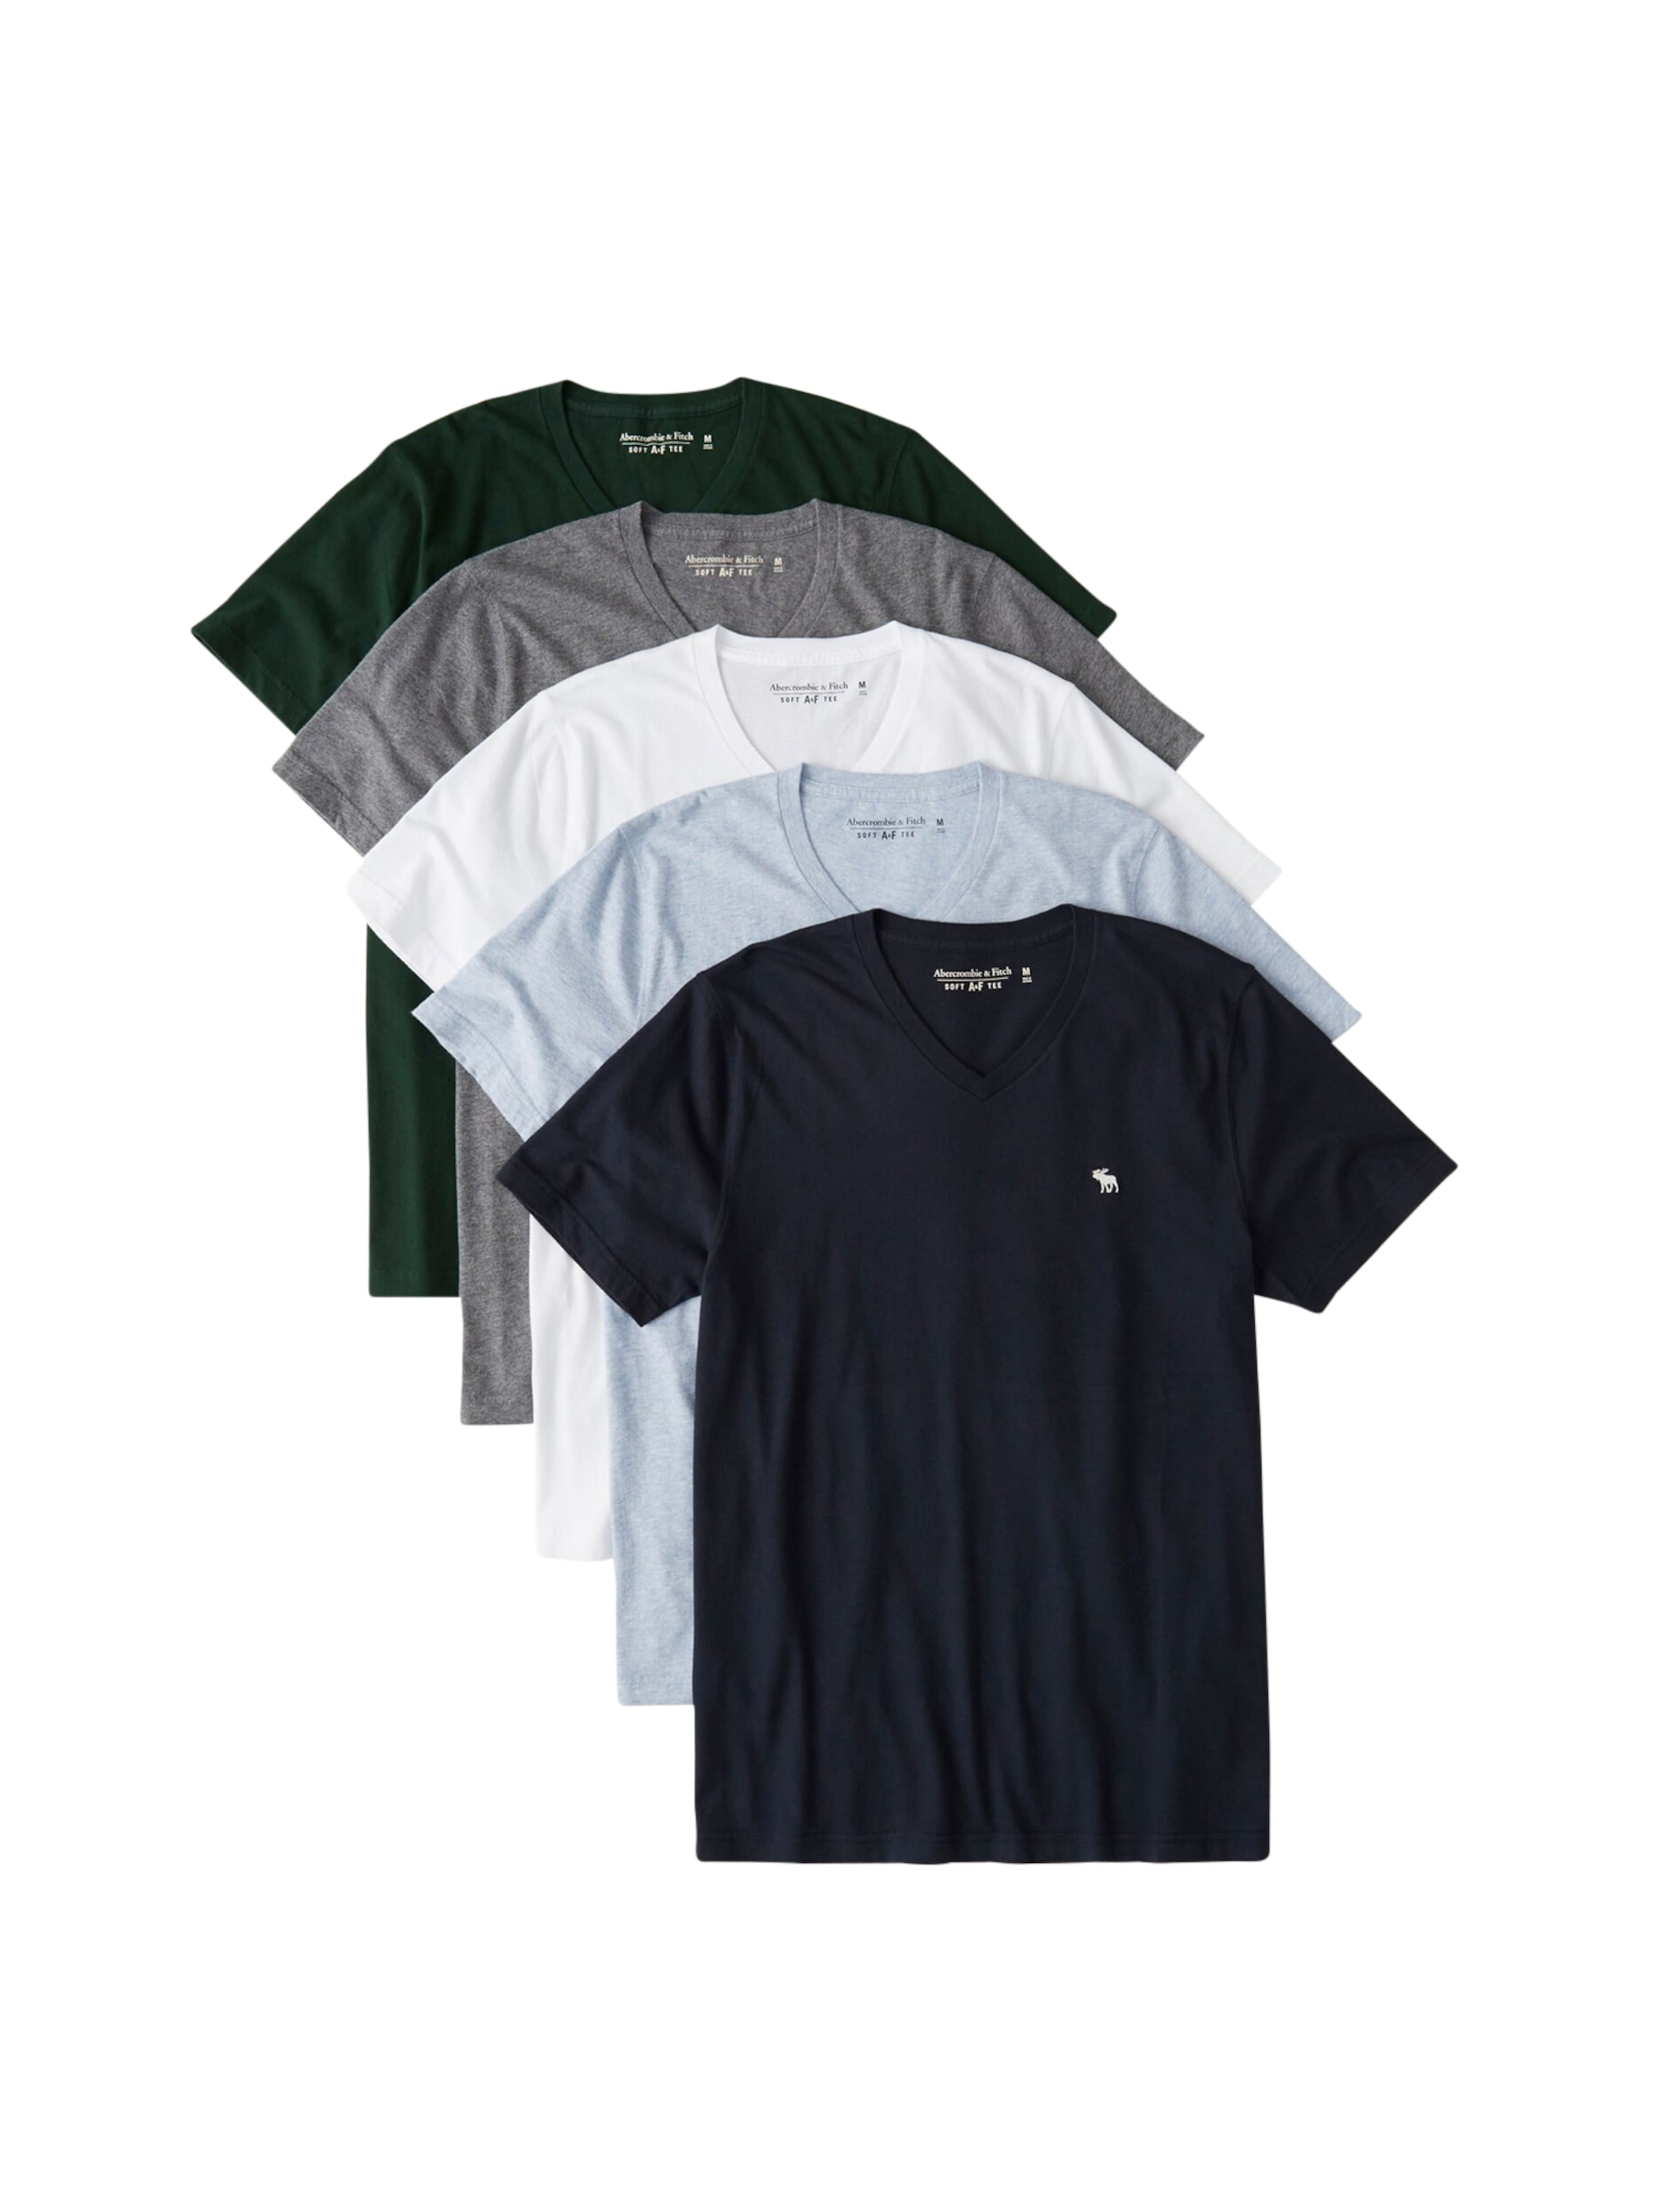 Vert Bleu Abercrombieamp; T Blanc En Fitch shirt Gris MarineClair v7Ybfyg6